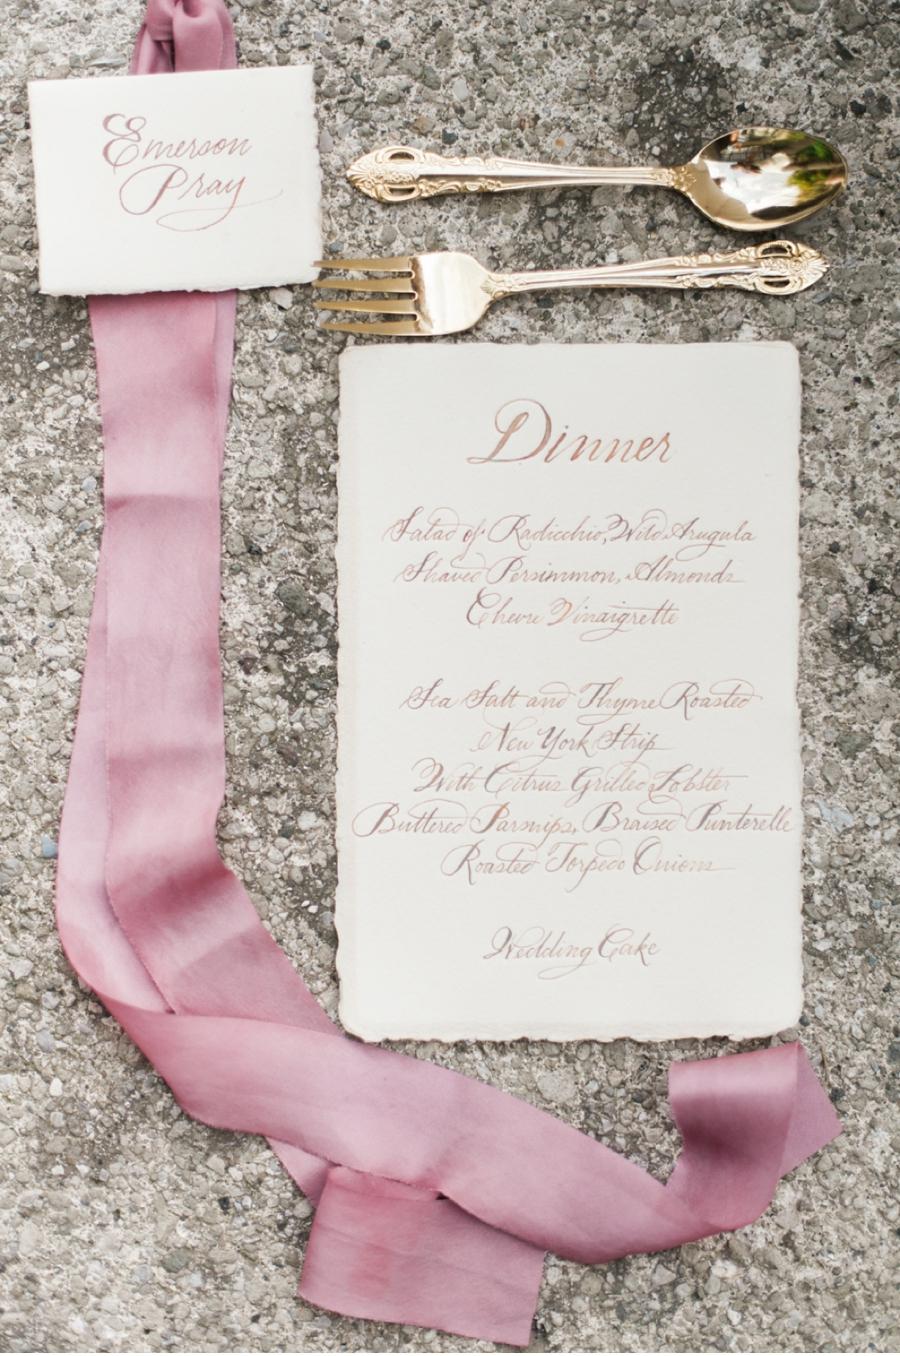 Calligraphy-and-wedding-stationary